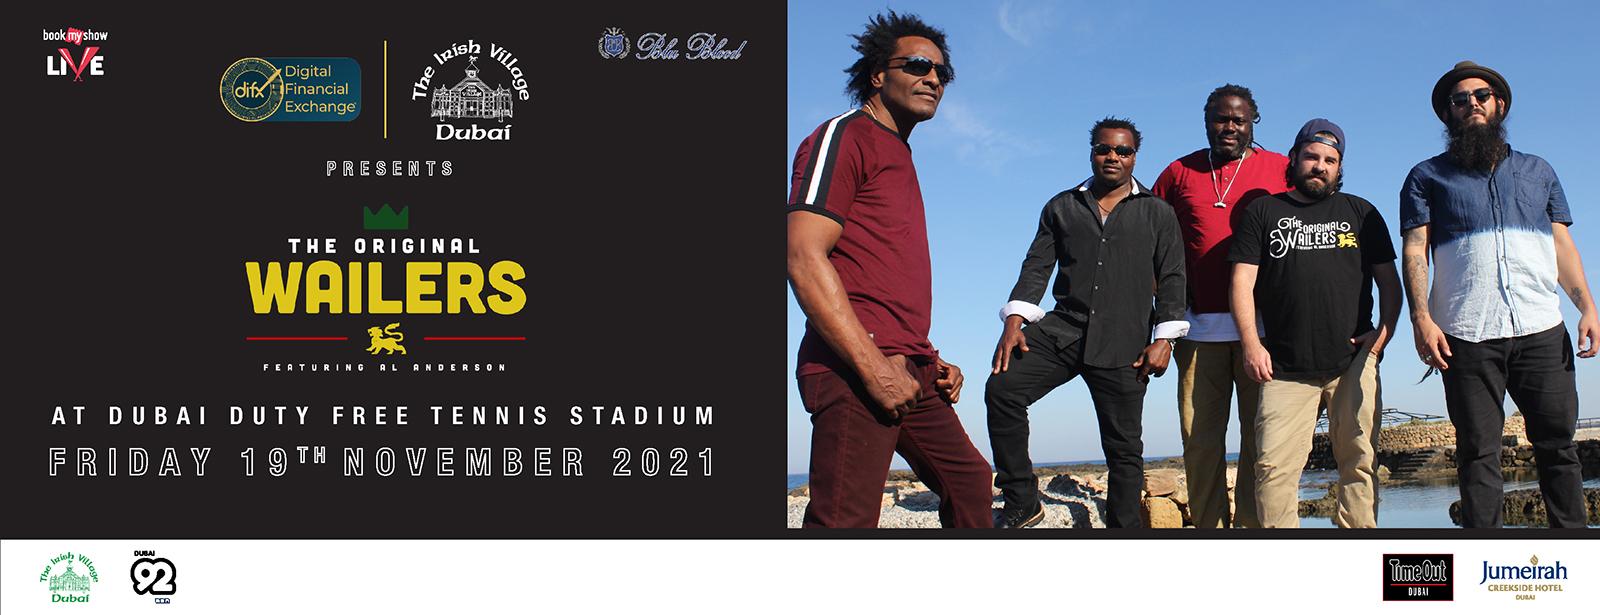 The Wailers Live in Dubai 2021